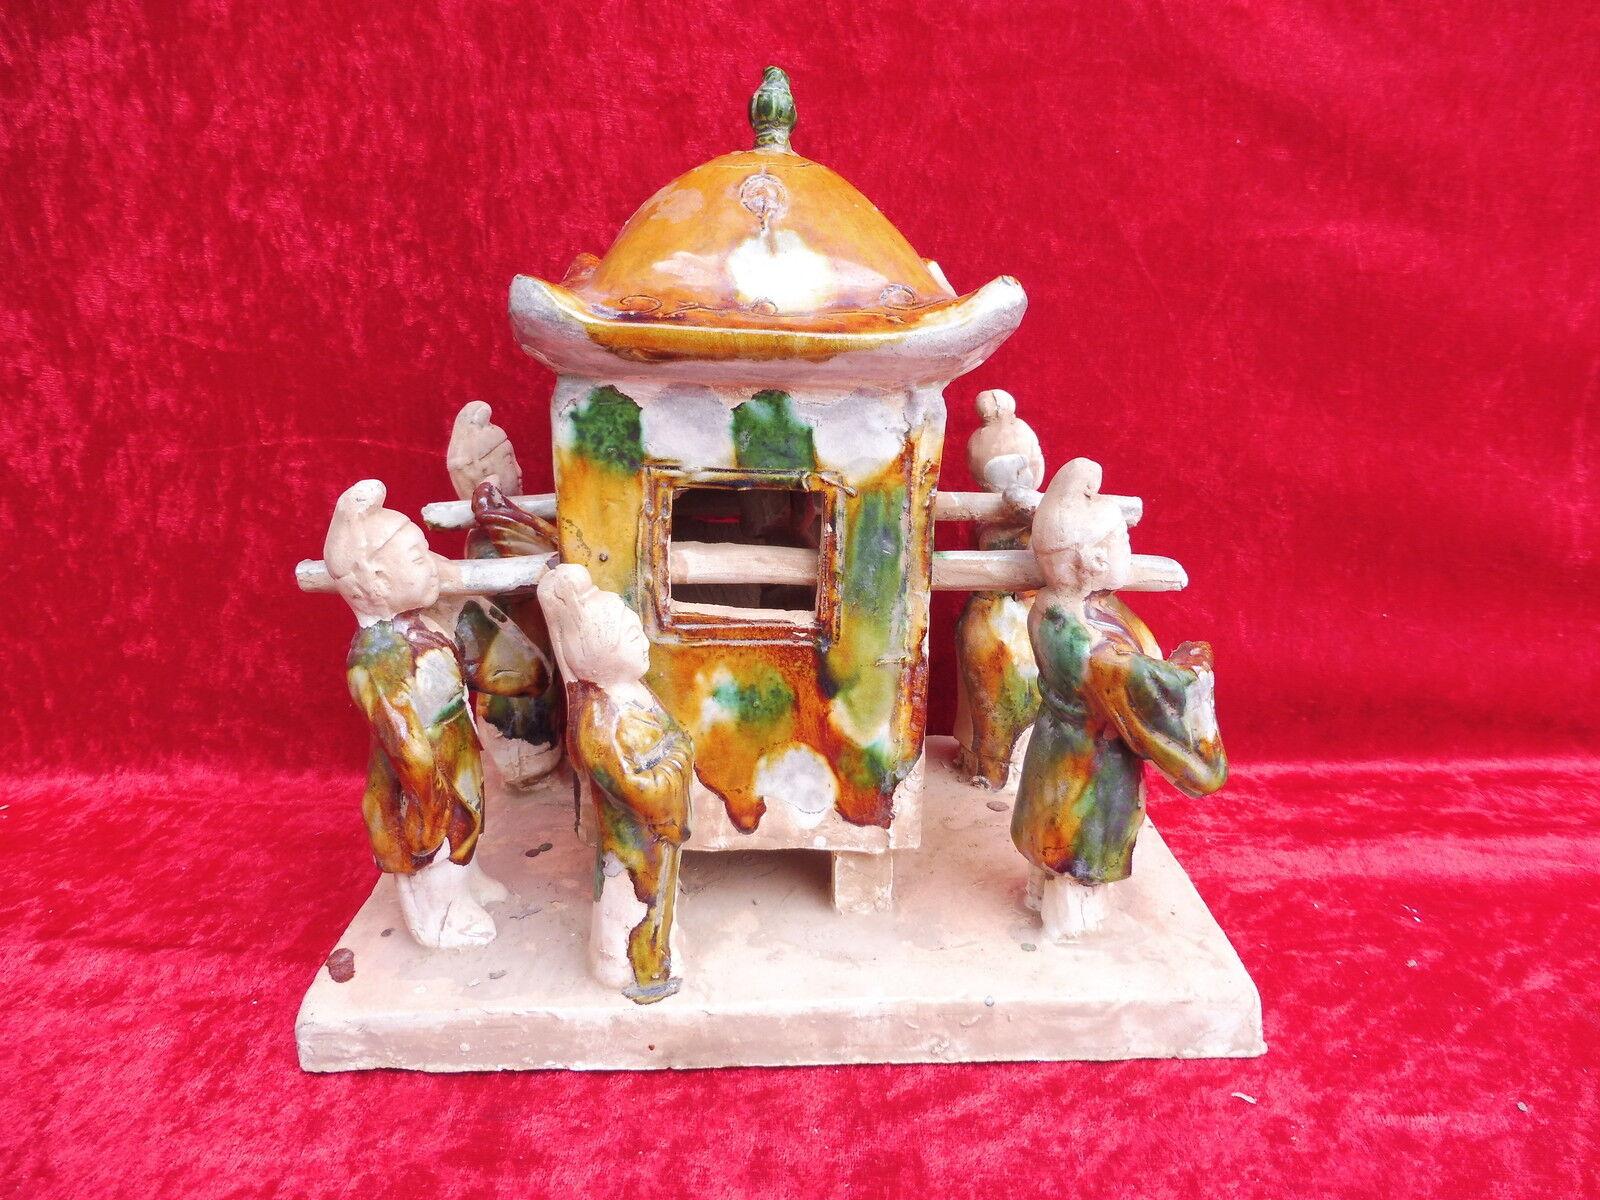 Schöne alte Keramik__China__Senfte Keramik__China__Senfte Keramik__China__Senfte mit Hofdame und Trägern__ glasiert 9fb97c